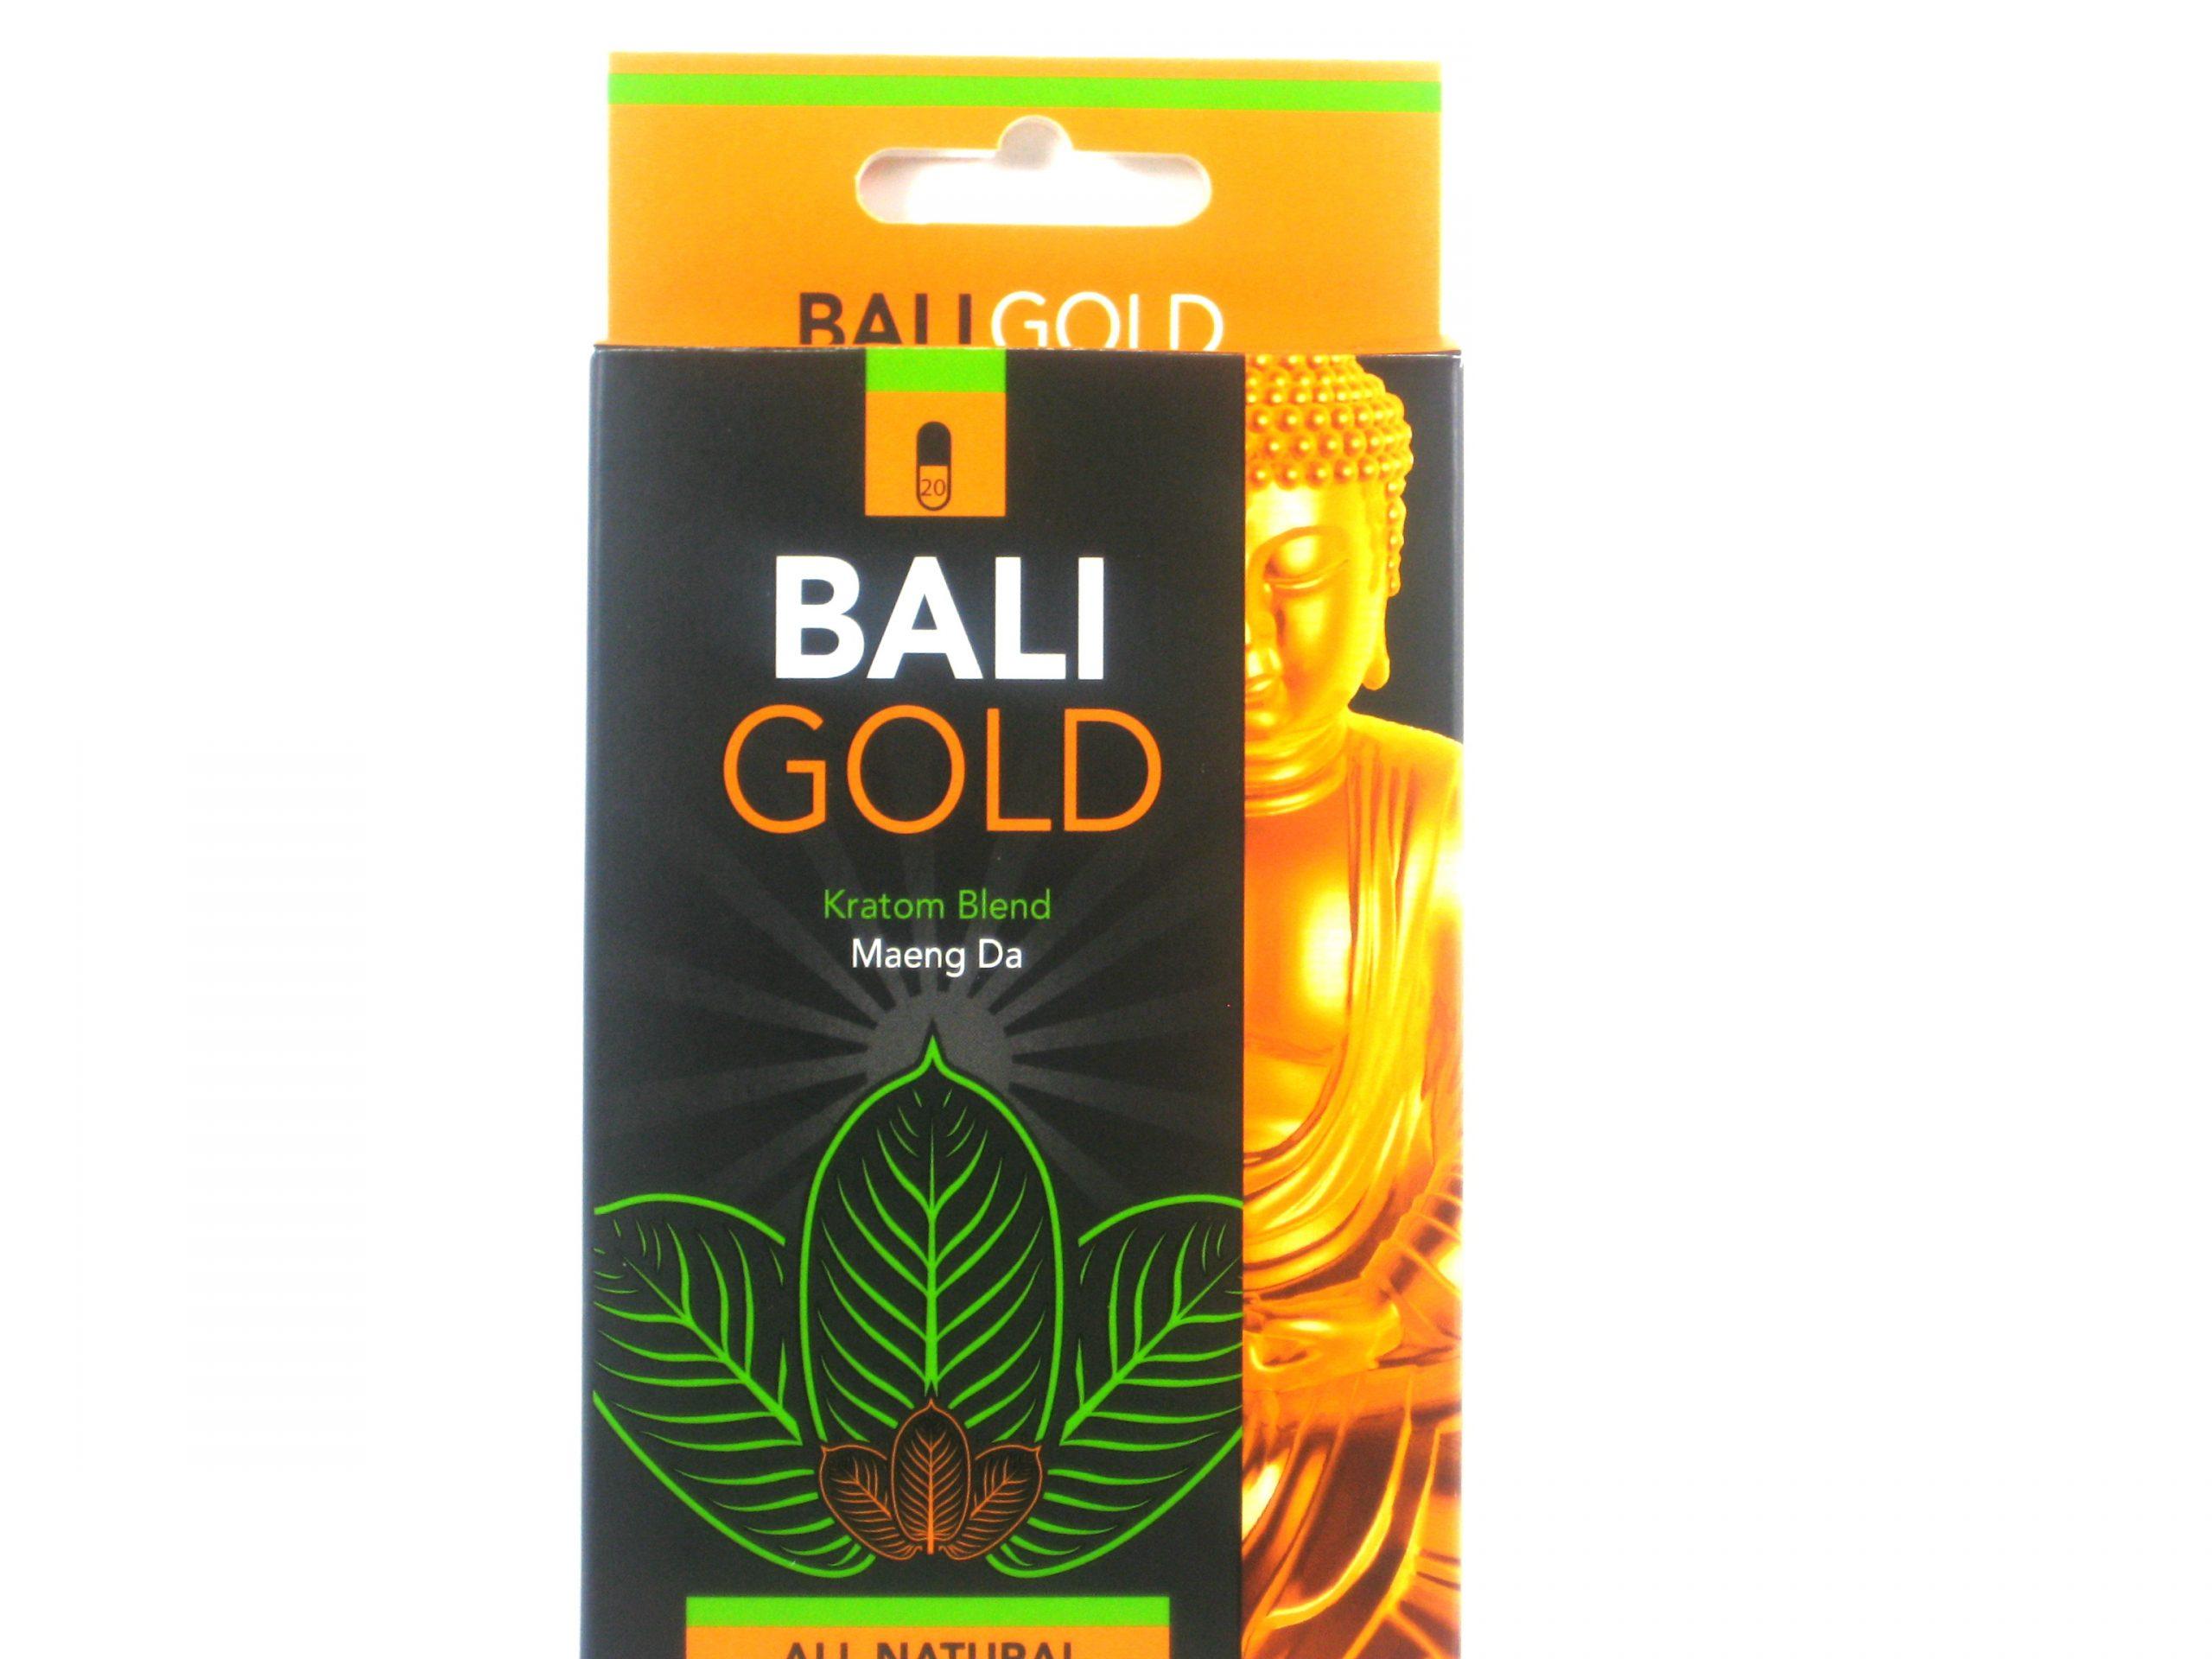 Bali Gold Maeng Da Kratom- 20 capsules